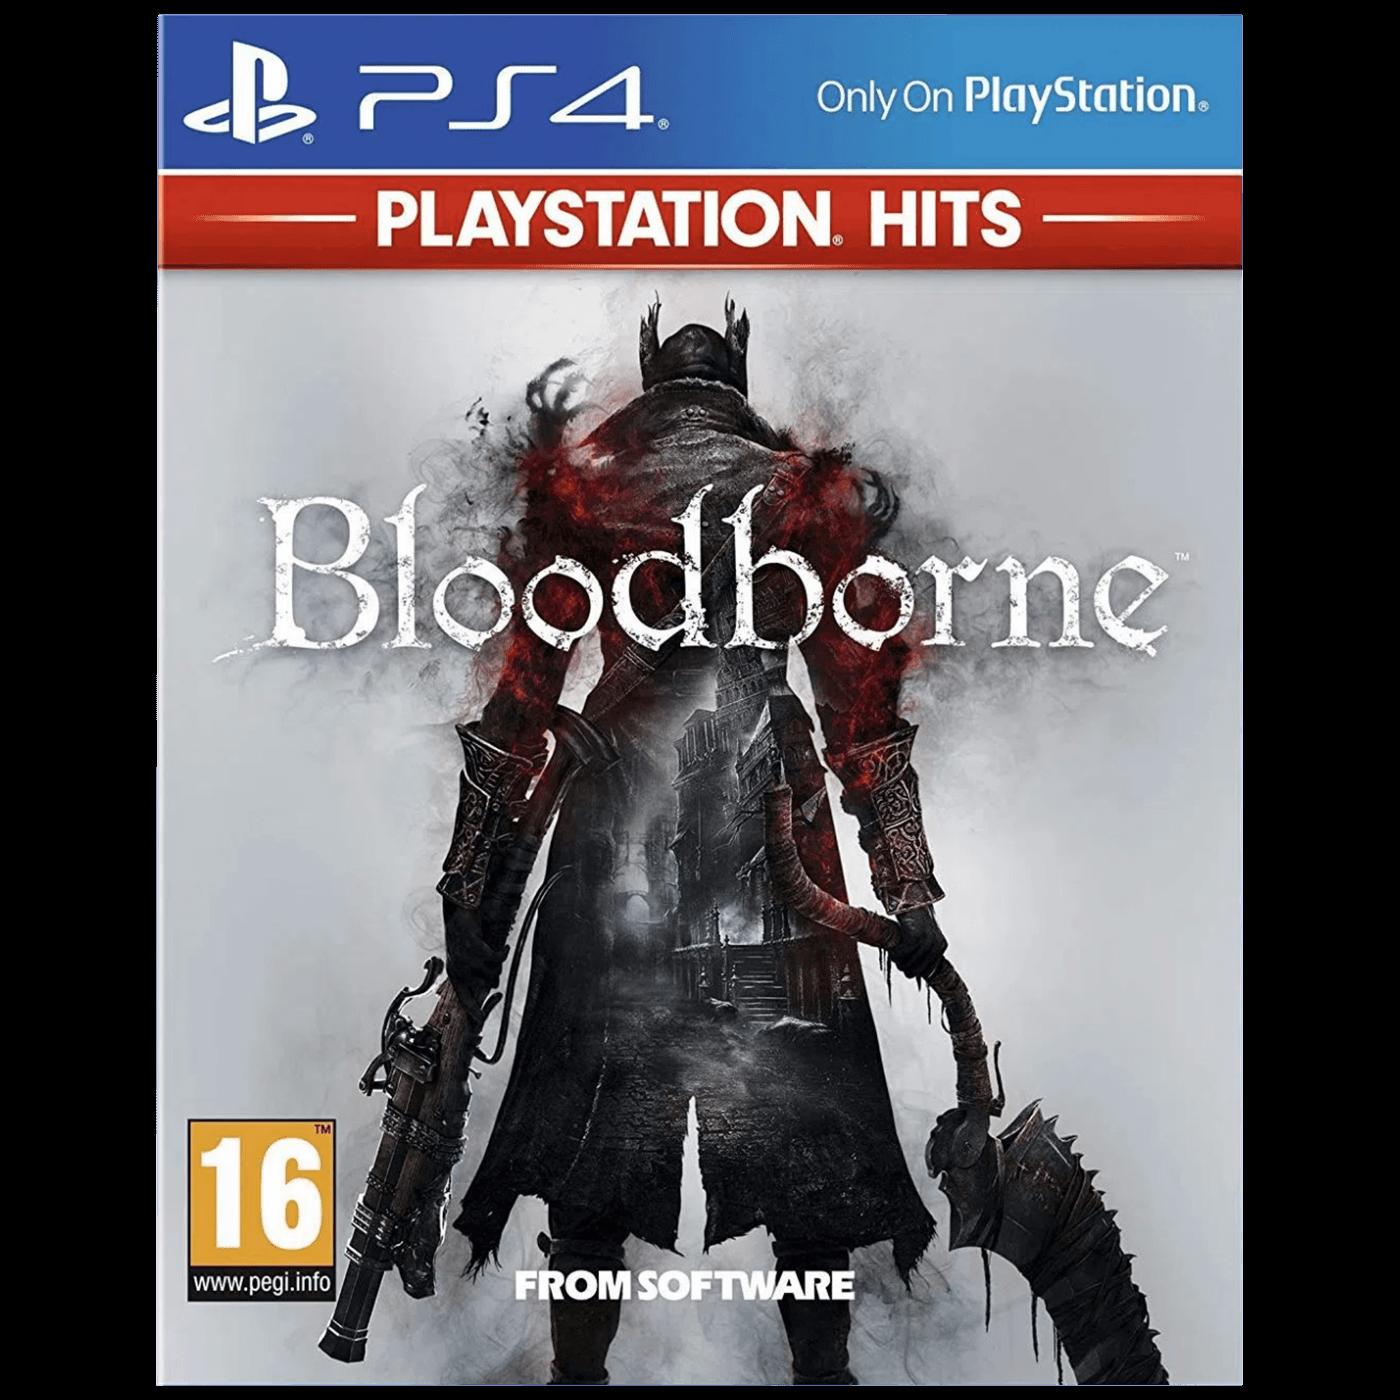 Bloodborne PS4 HITS